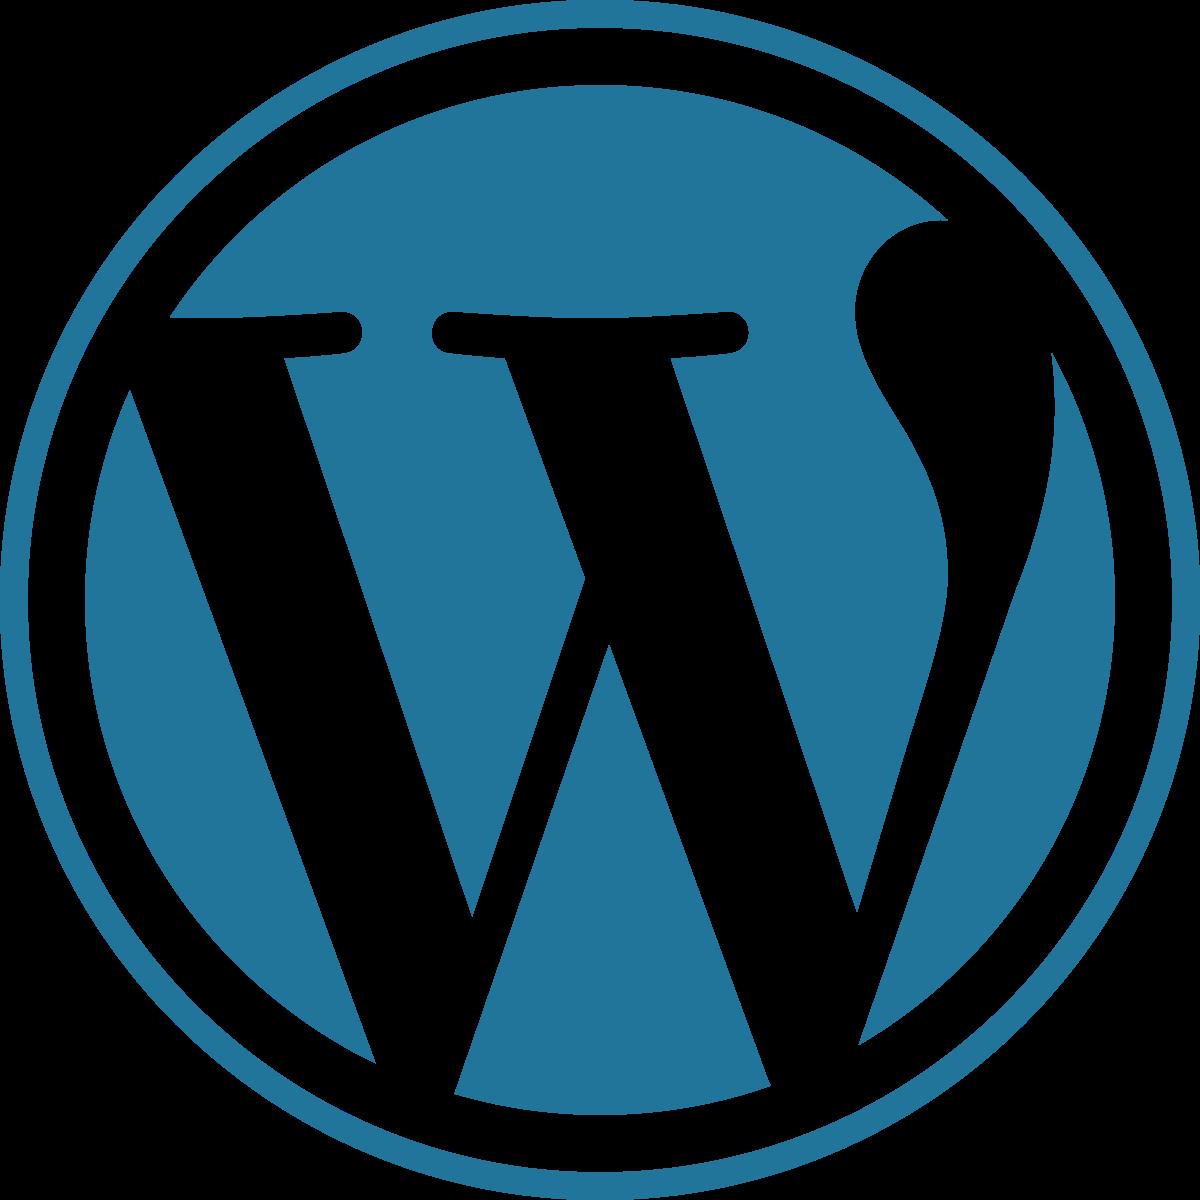 Wordpres TUmblr alternative blogging platform